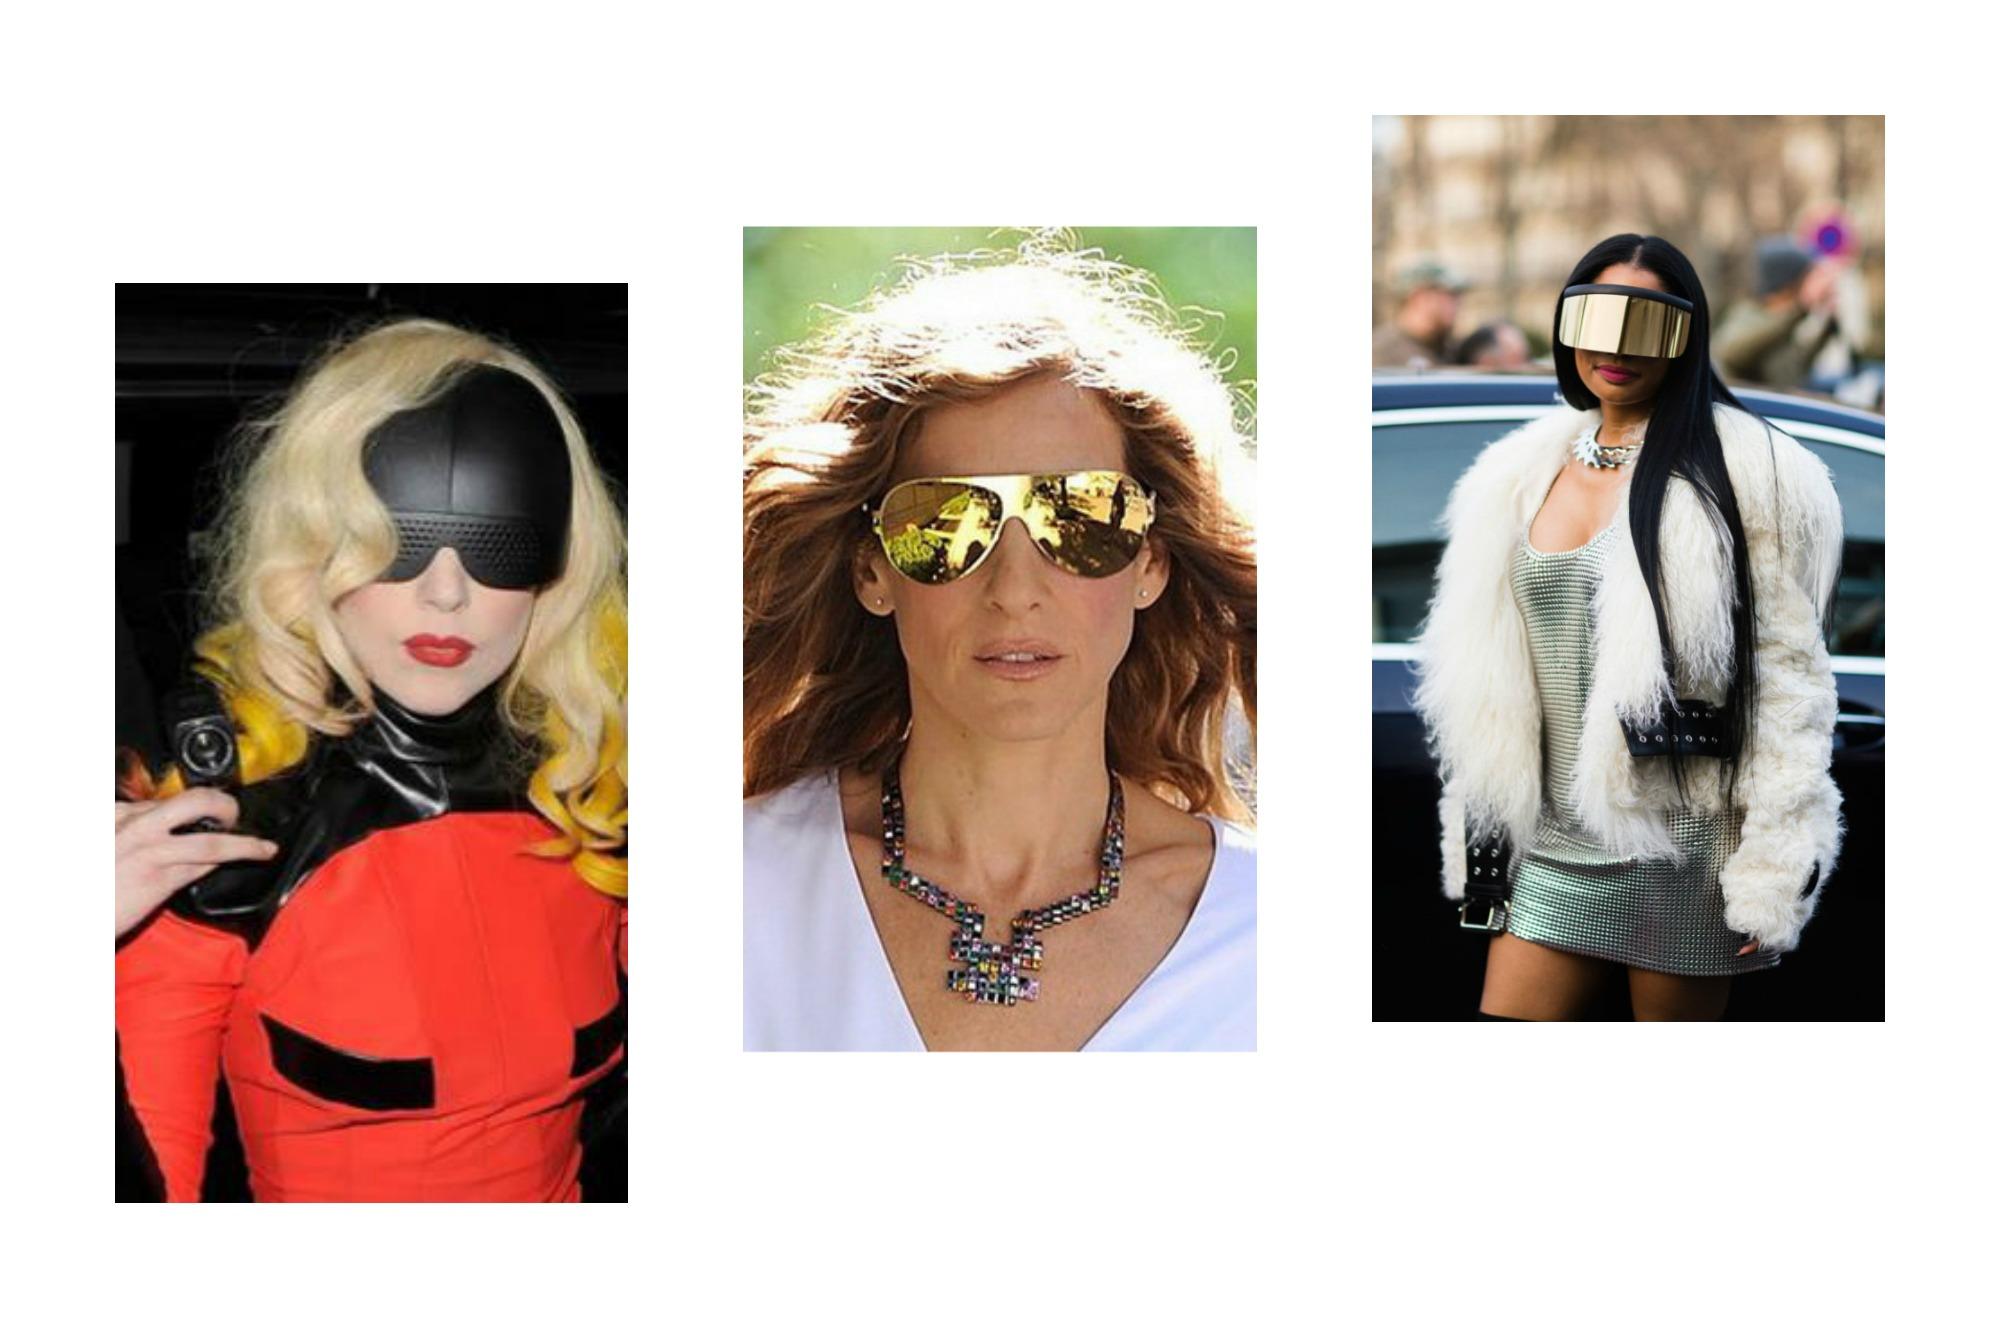 PicMonkey Collage (5)